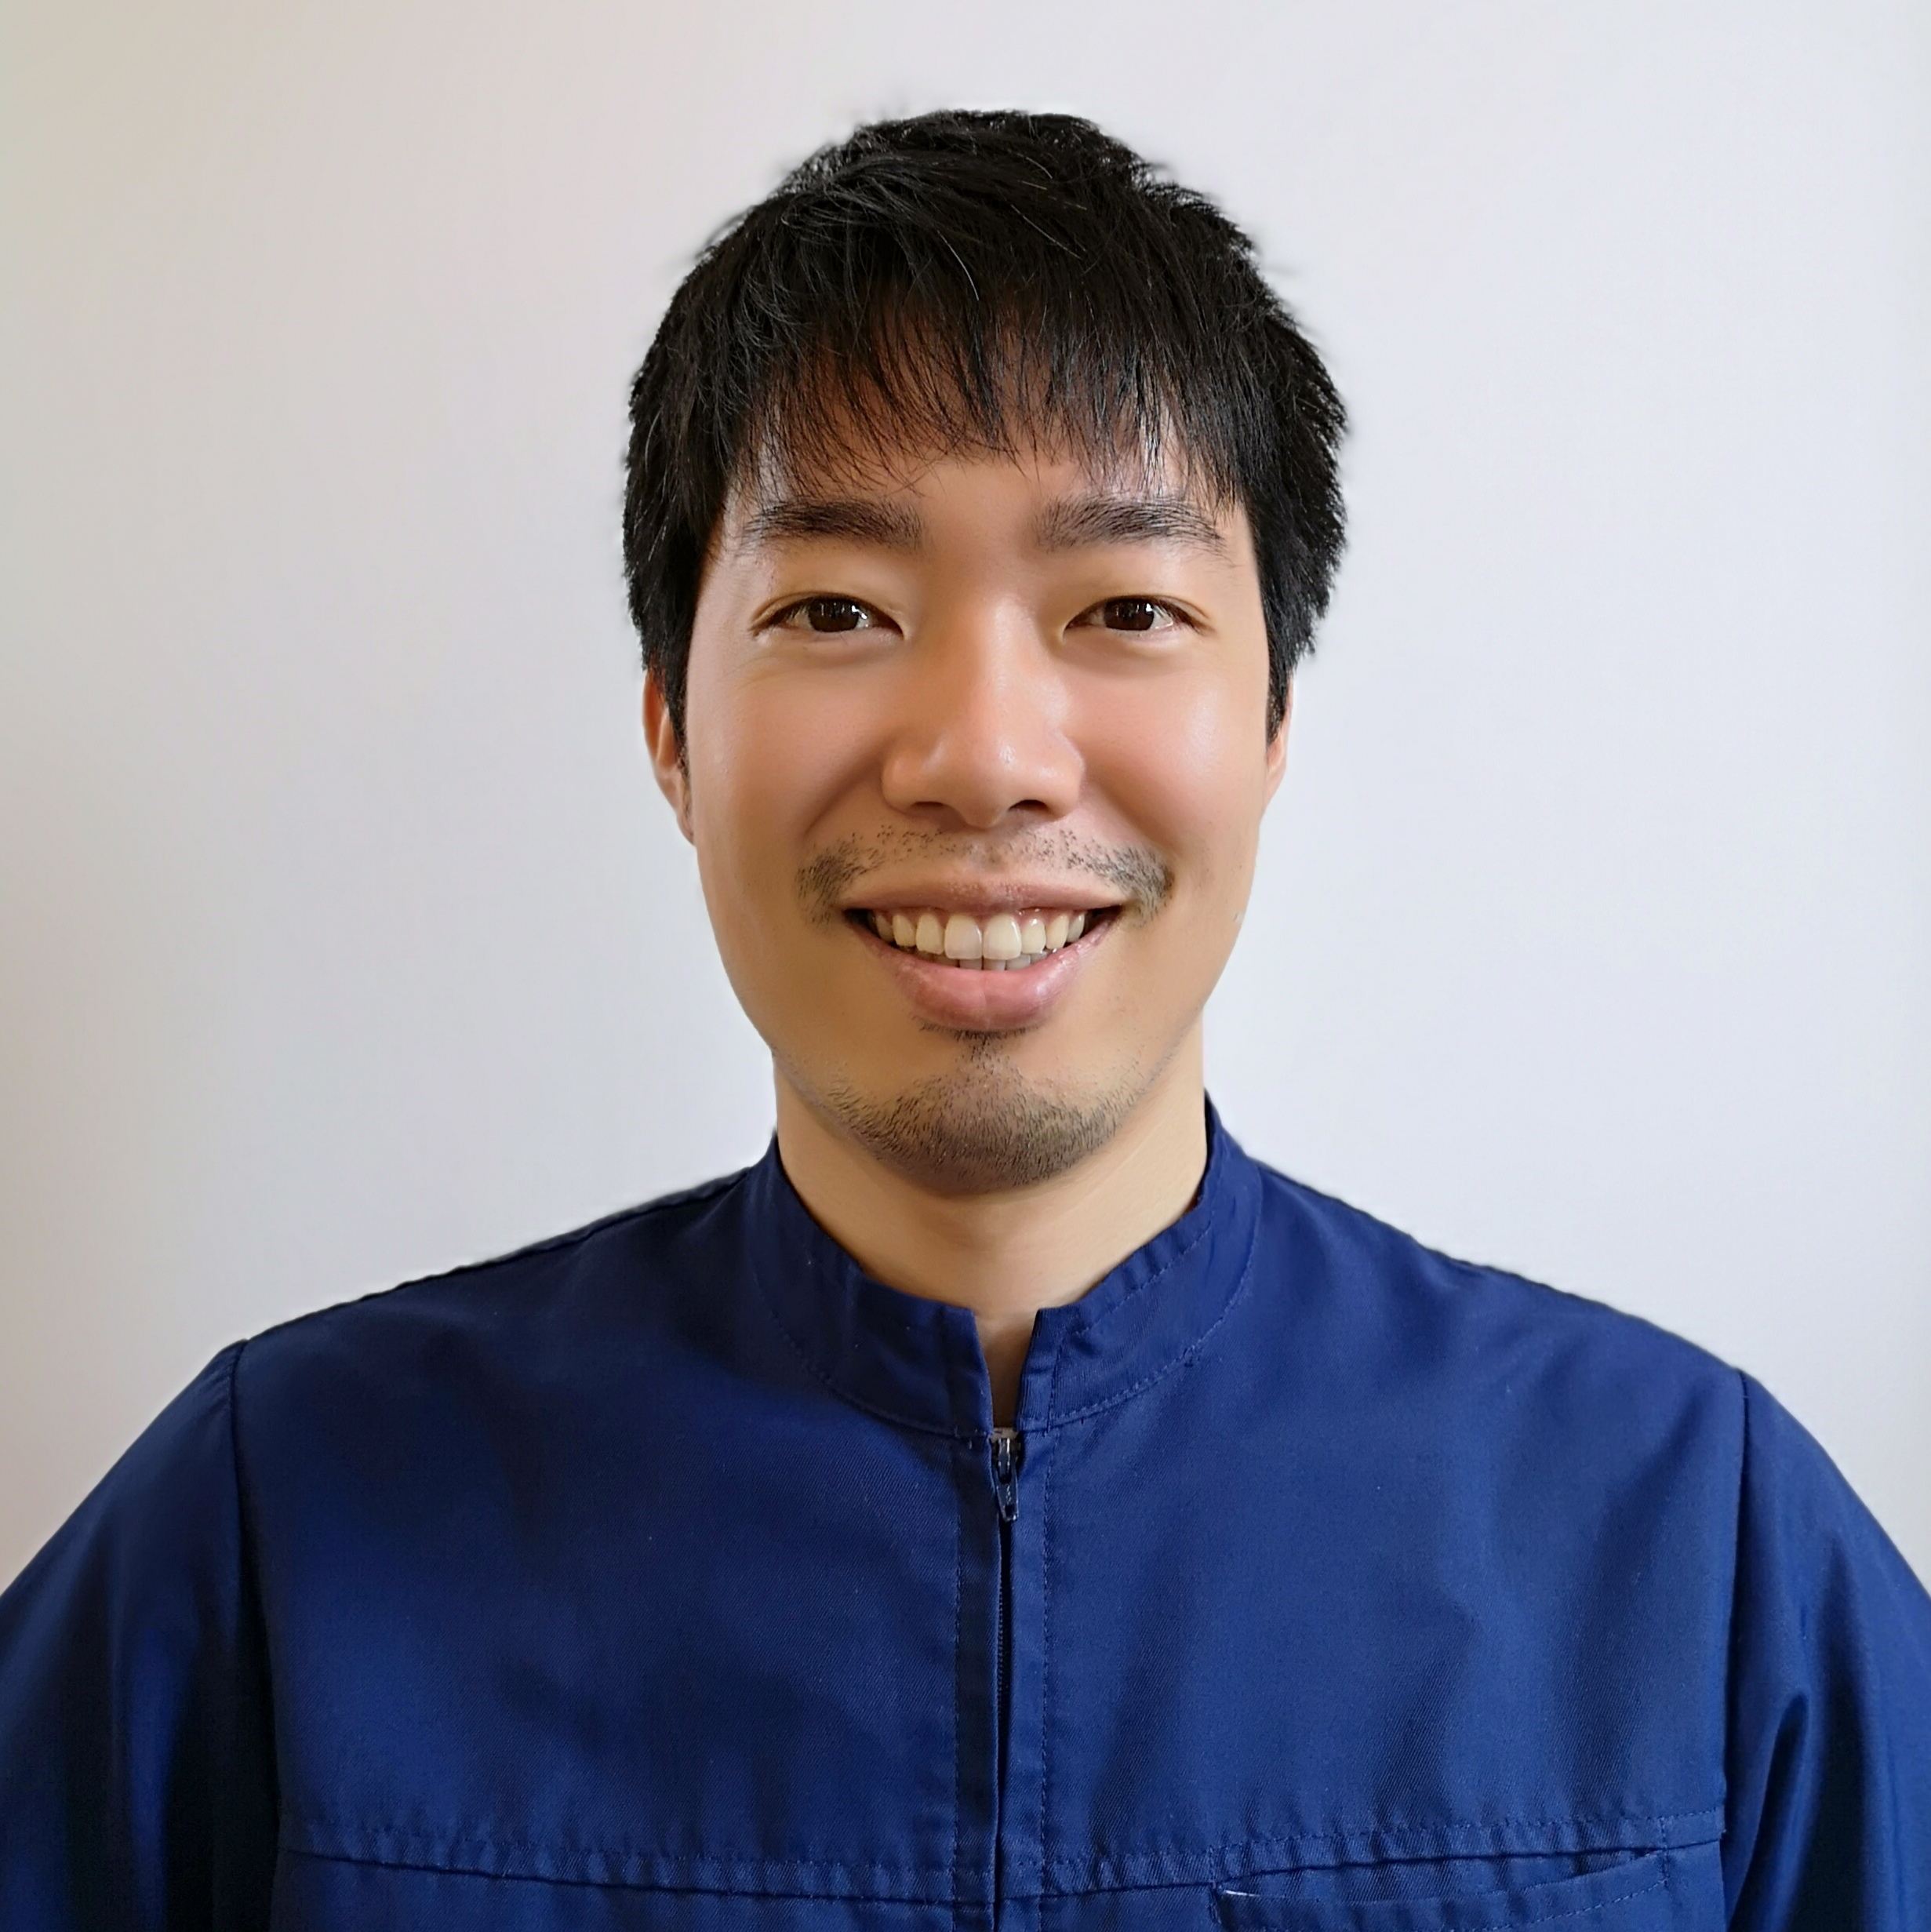 Dr小道.jpg